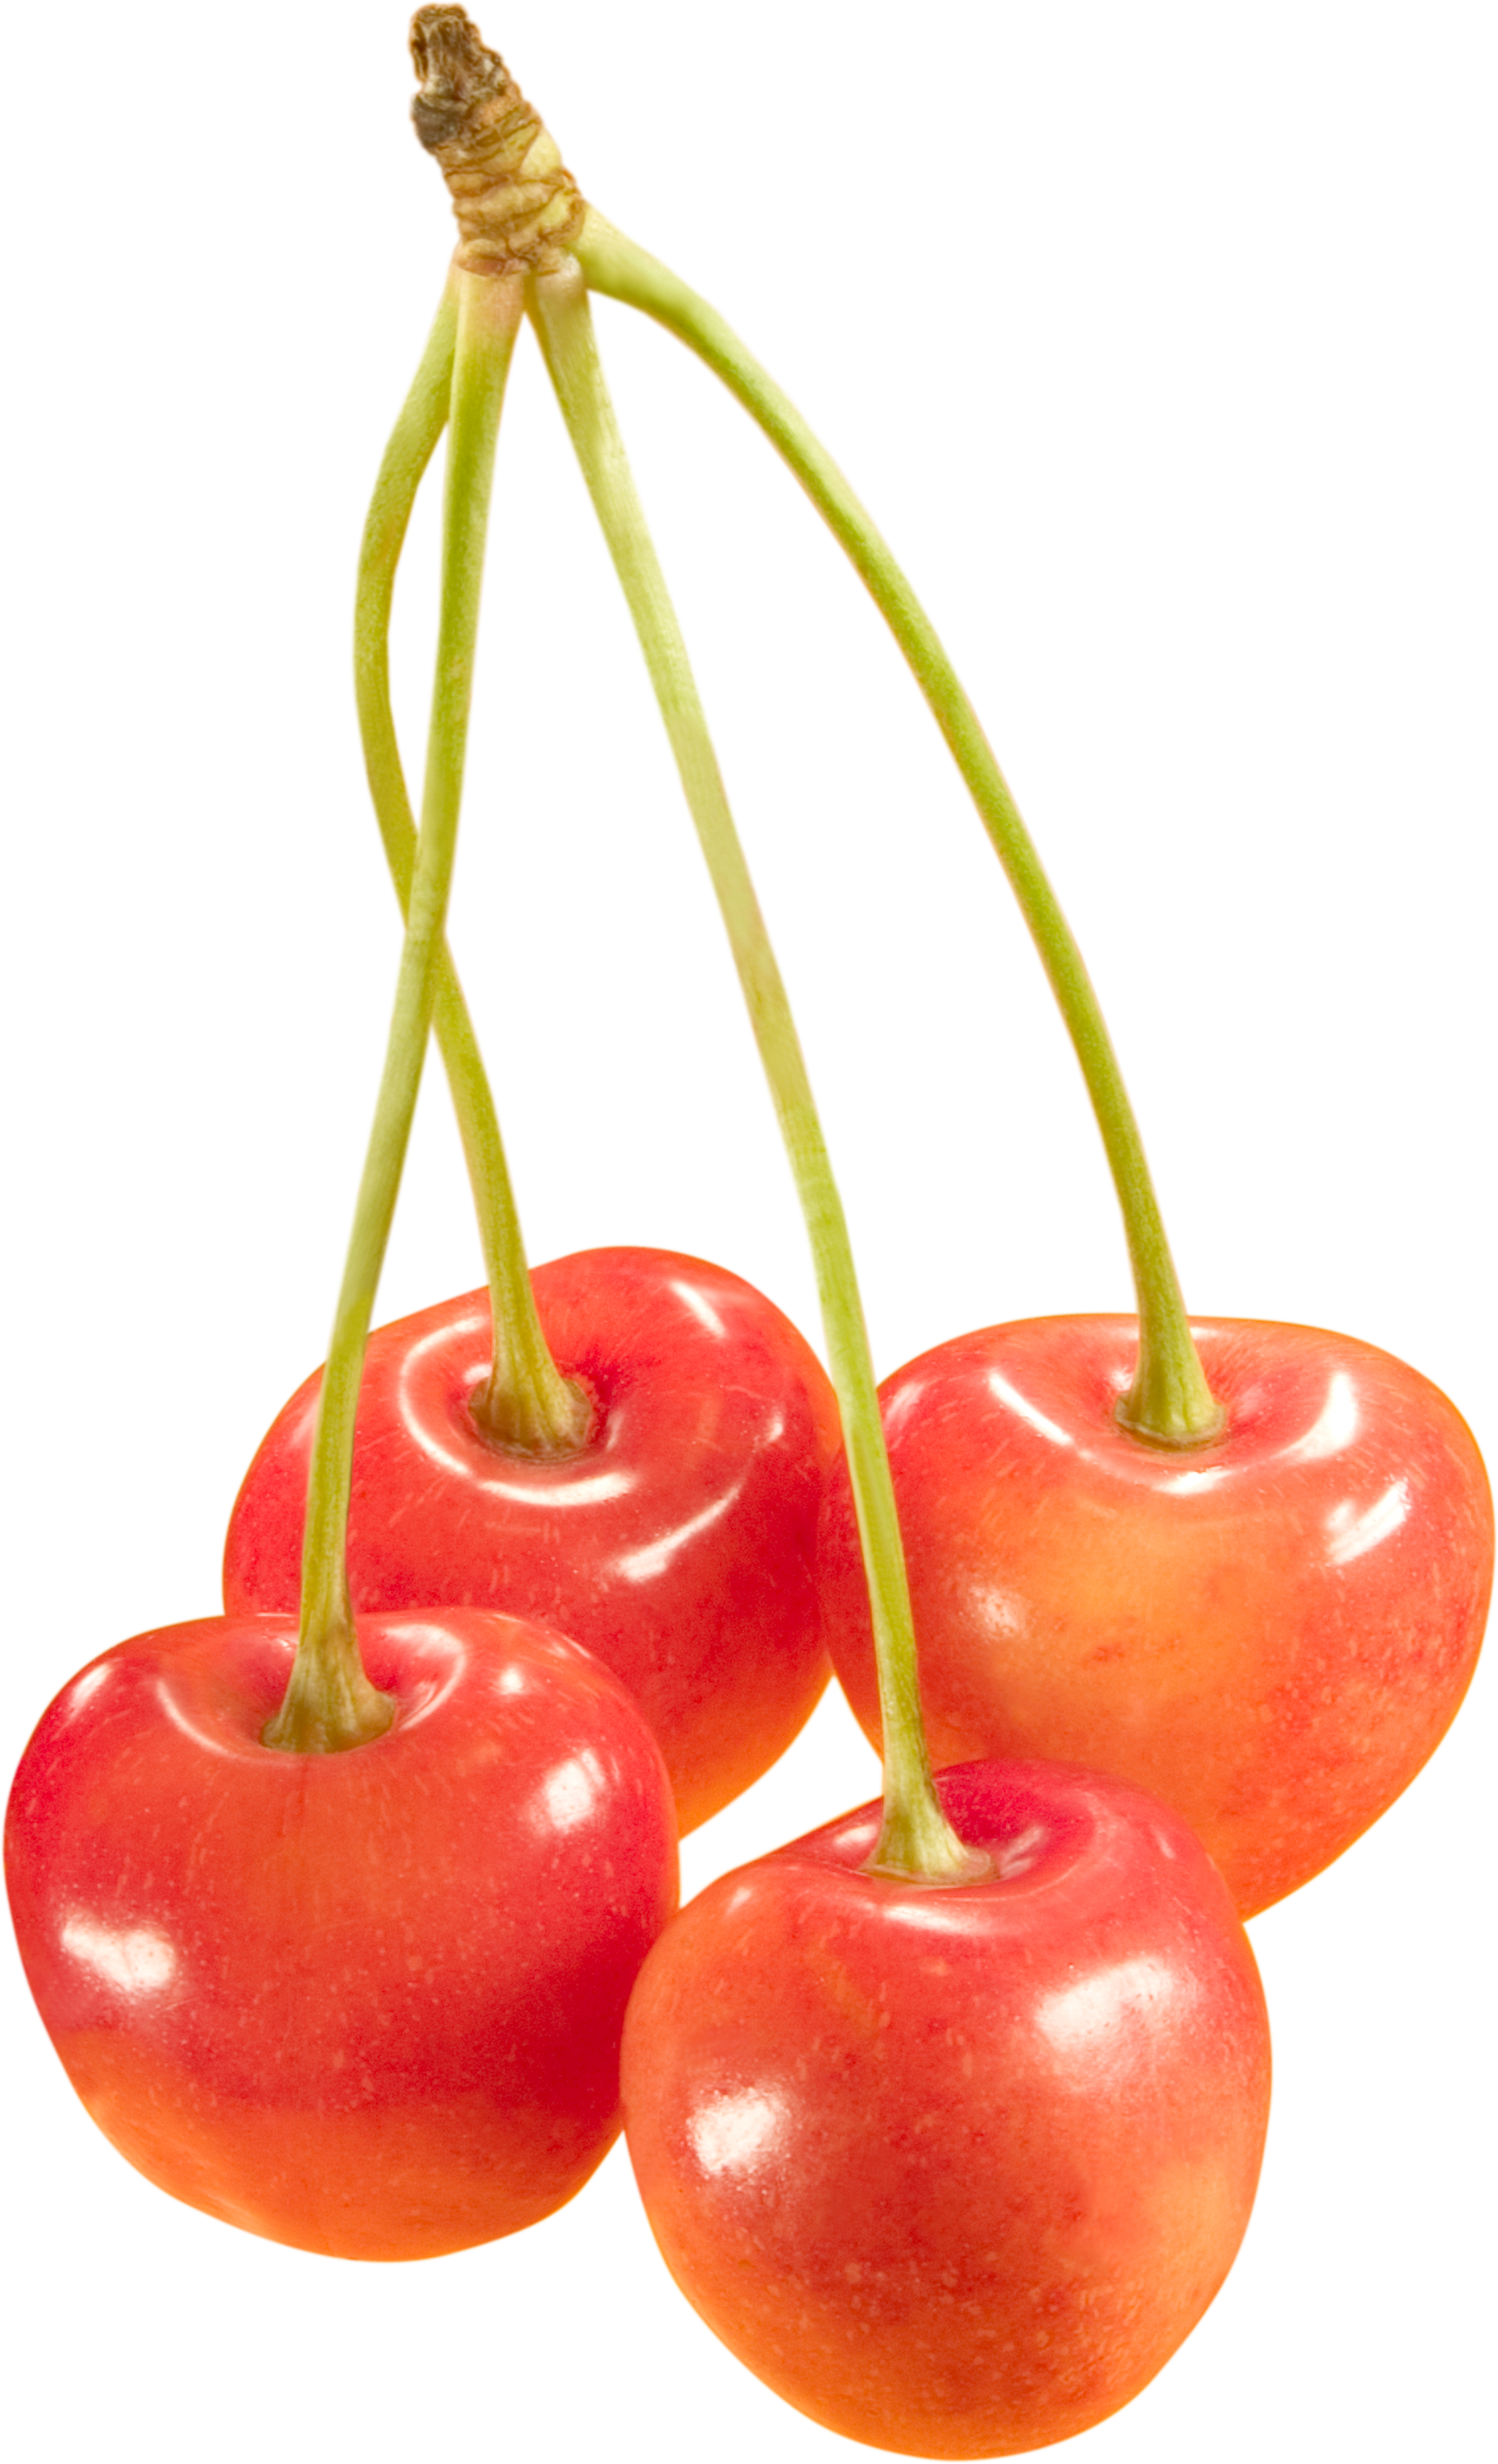 Cherries PNG Image